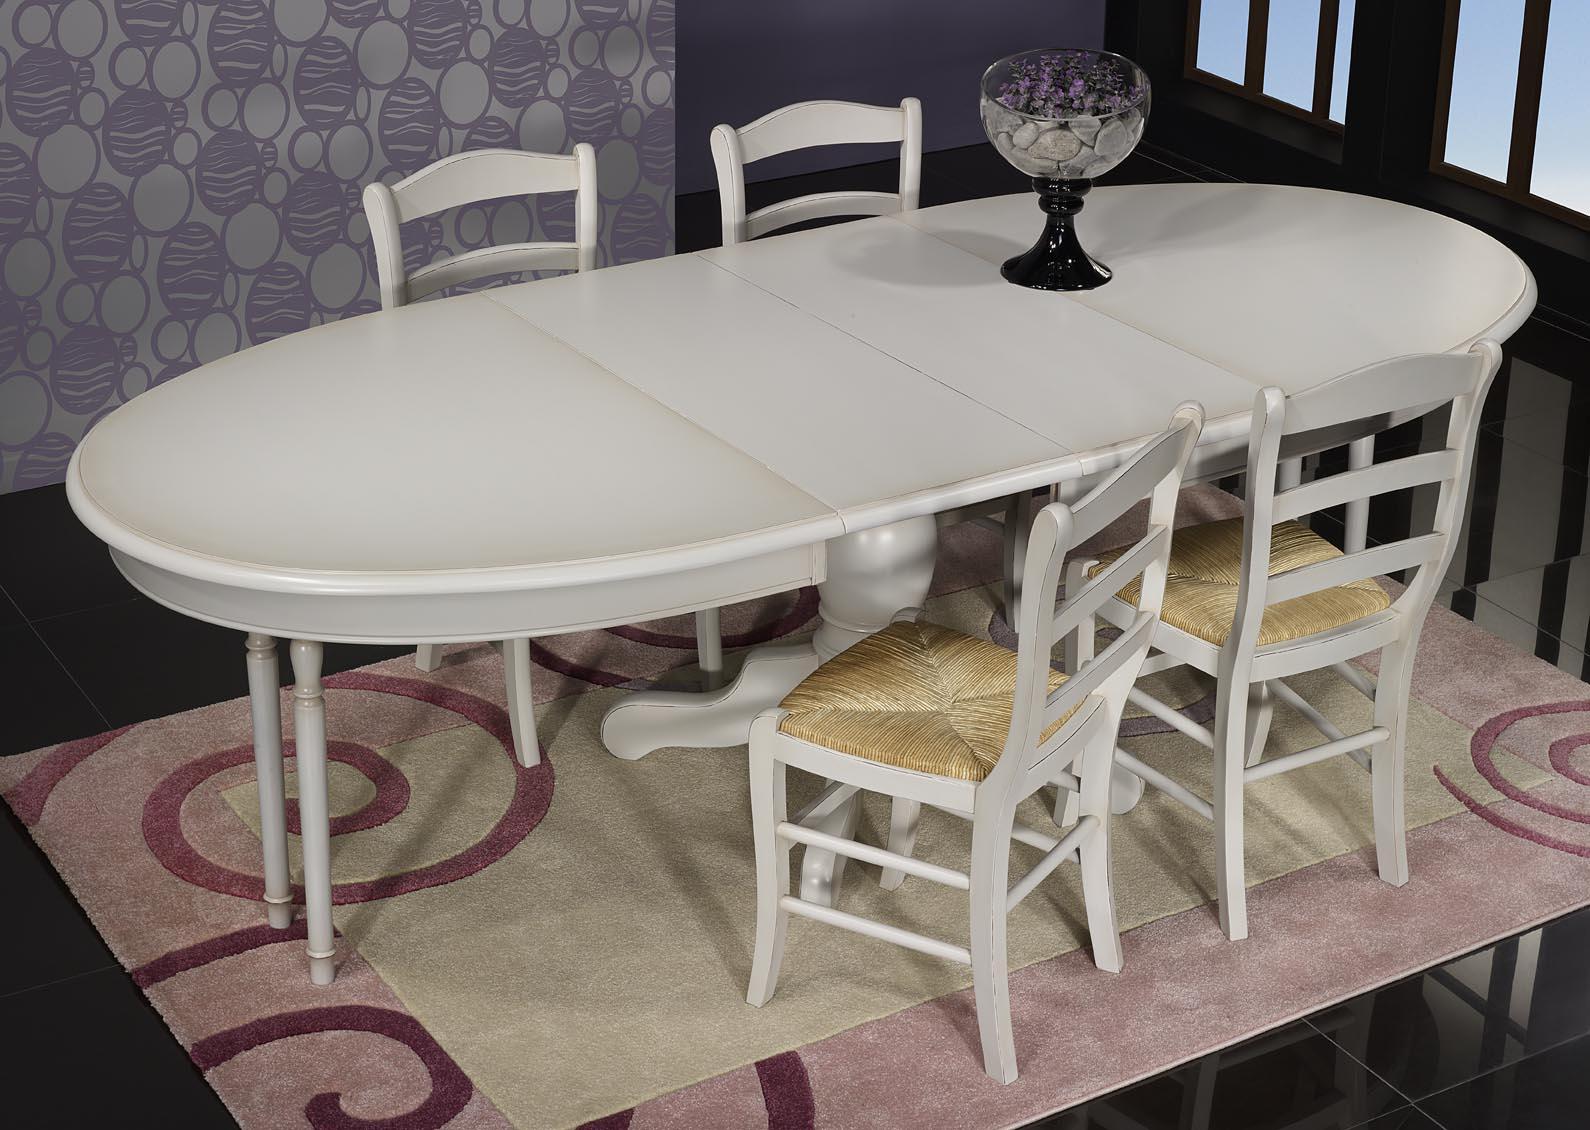 table ovale 135x110 pied central delphine en merisier. Black Bedroom Furniture Sets. Home Design Ideas